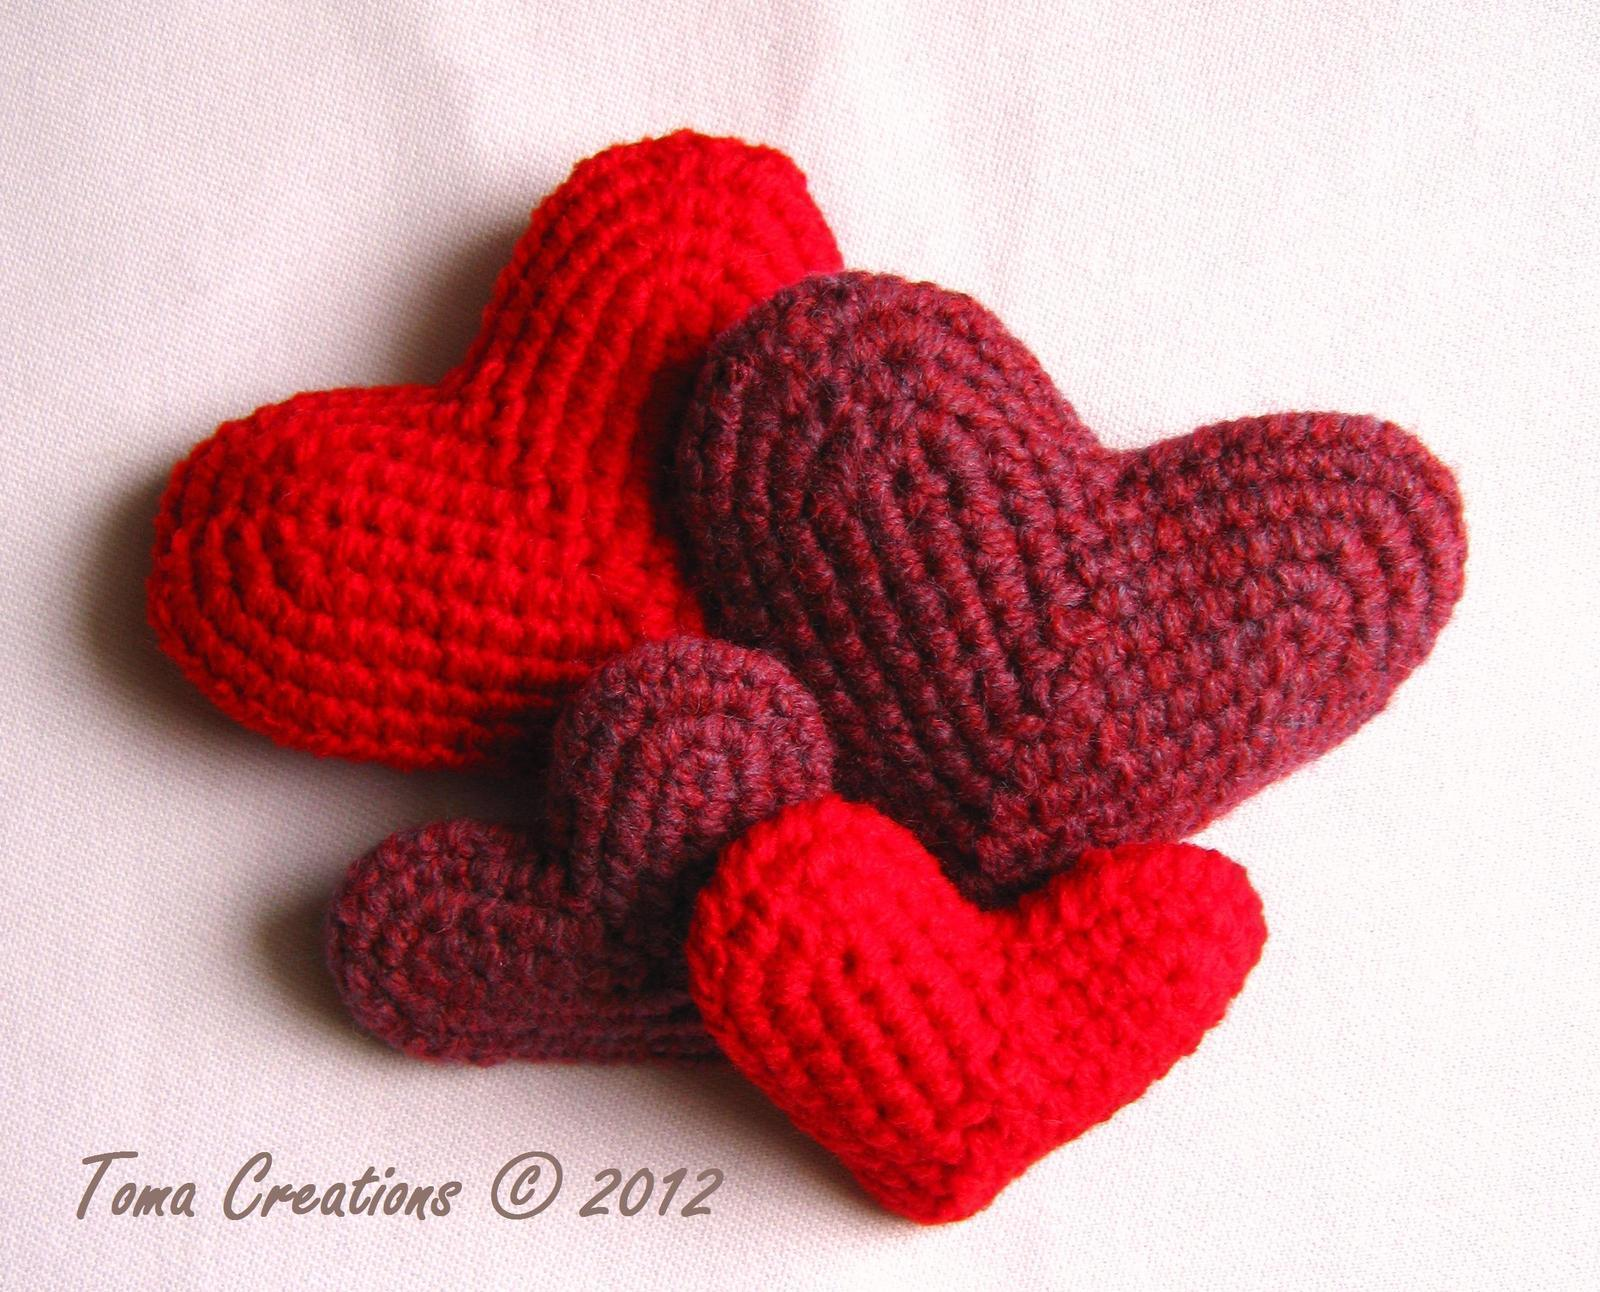 Crocheted Hearts How To Make A Shape Plushie Crochet